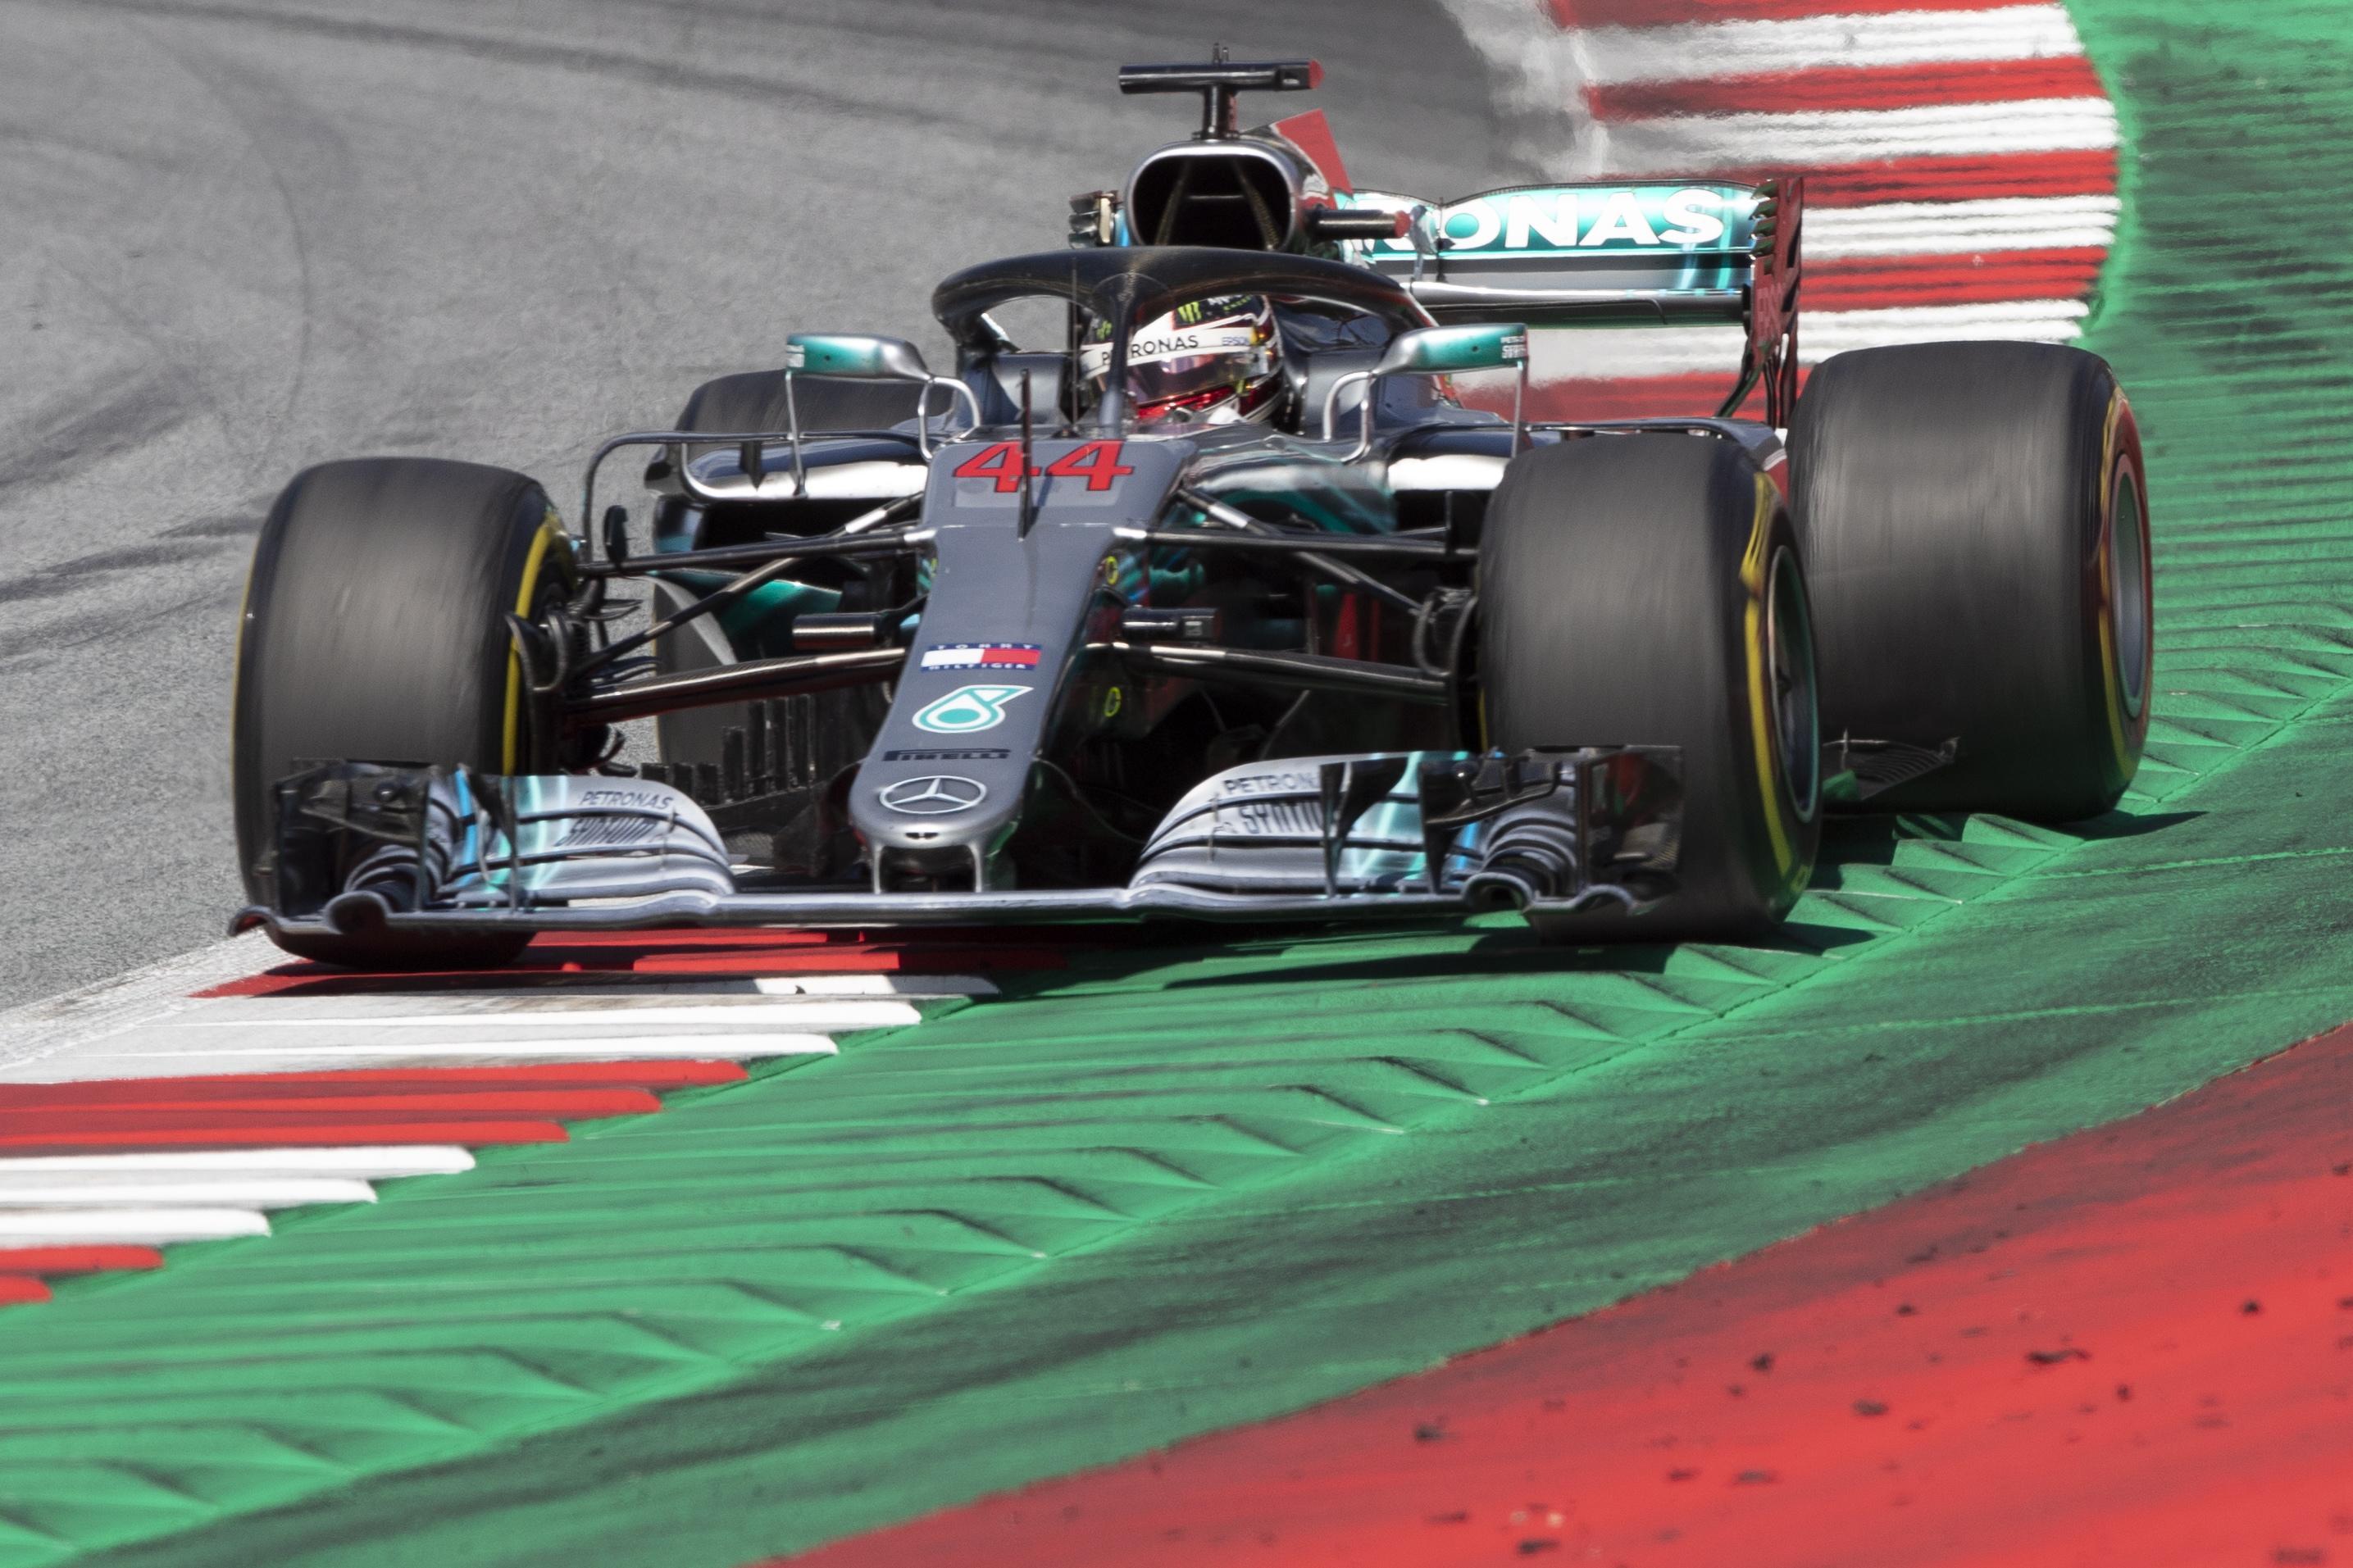 Hamilton surrendered his title lead to Sebastian Vettel